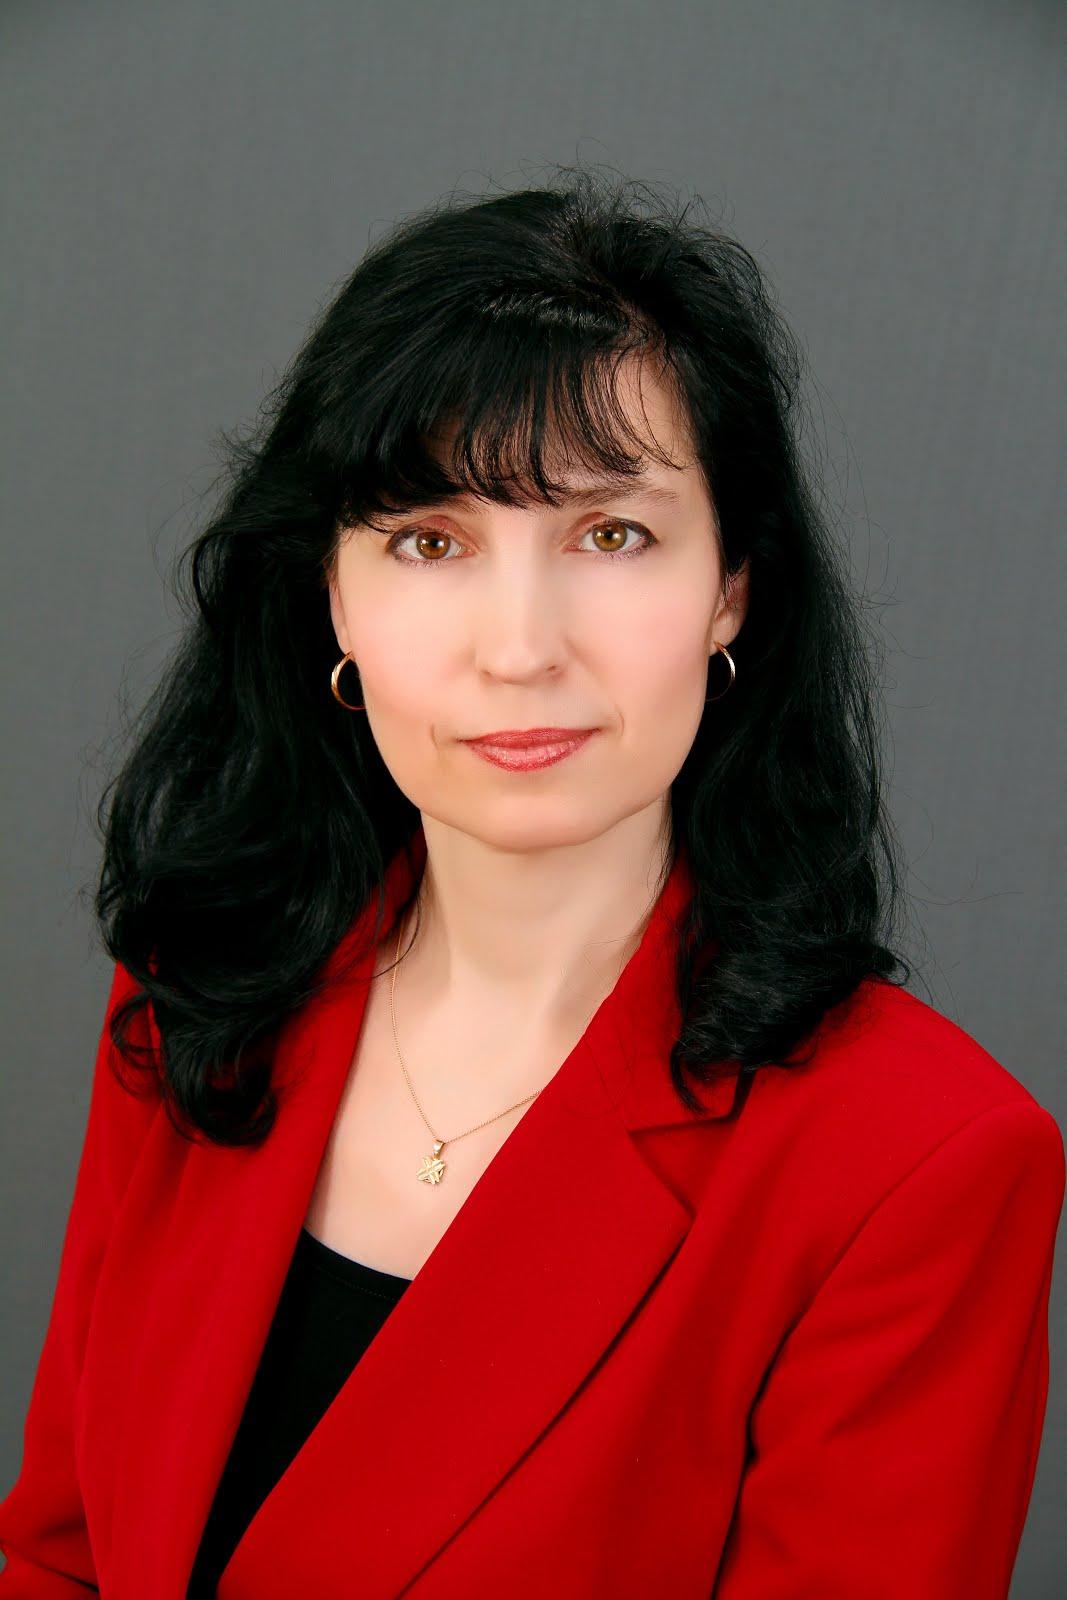 Шеламова Елена Станиславовна